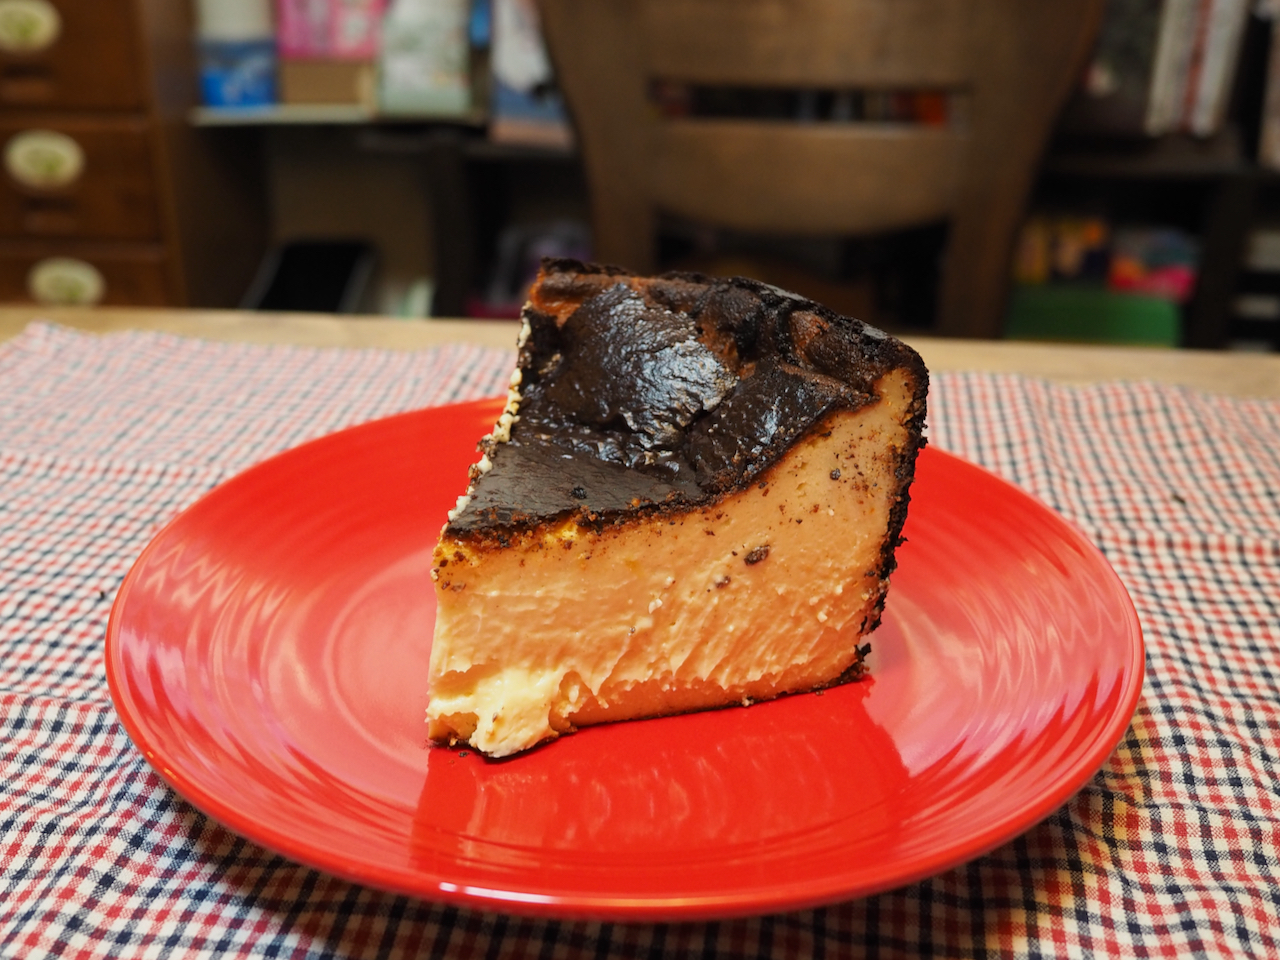 Basque_cheese_cake_2105-114.jpeg